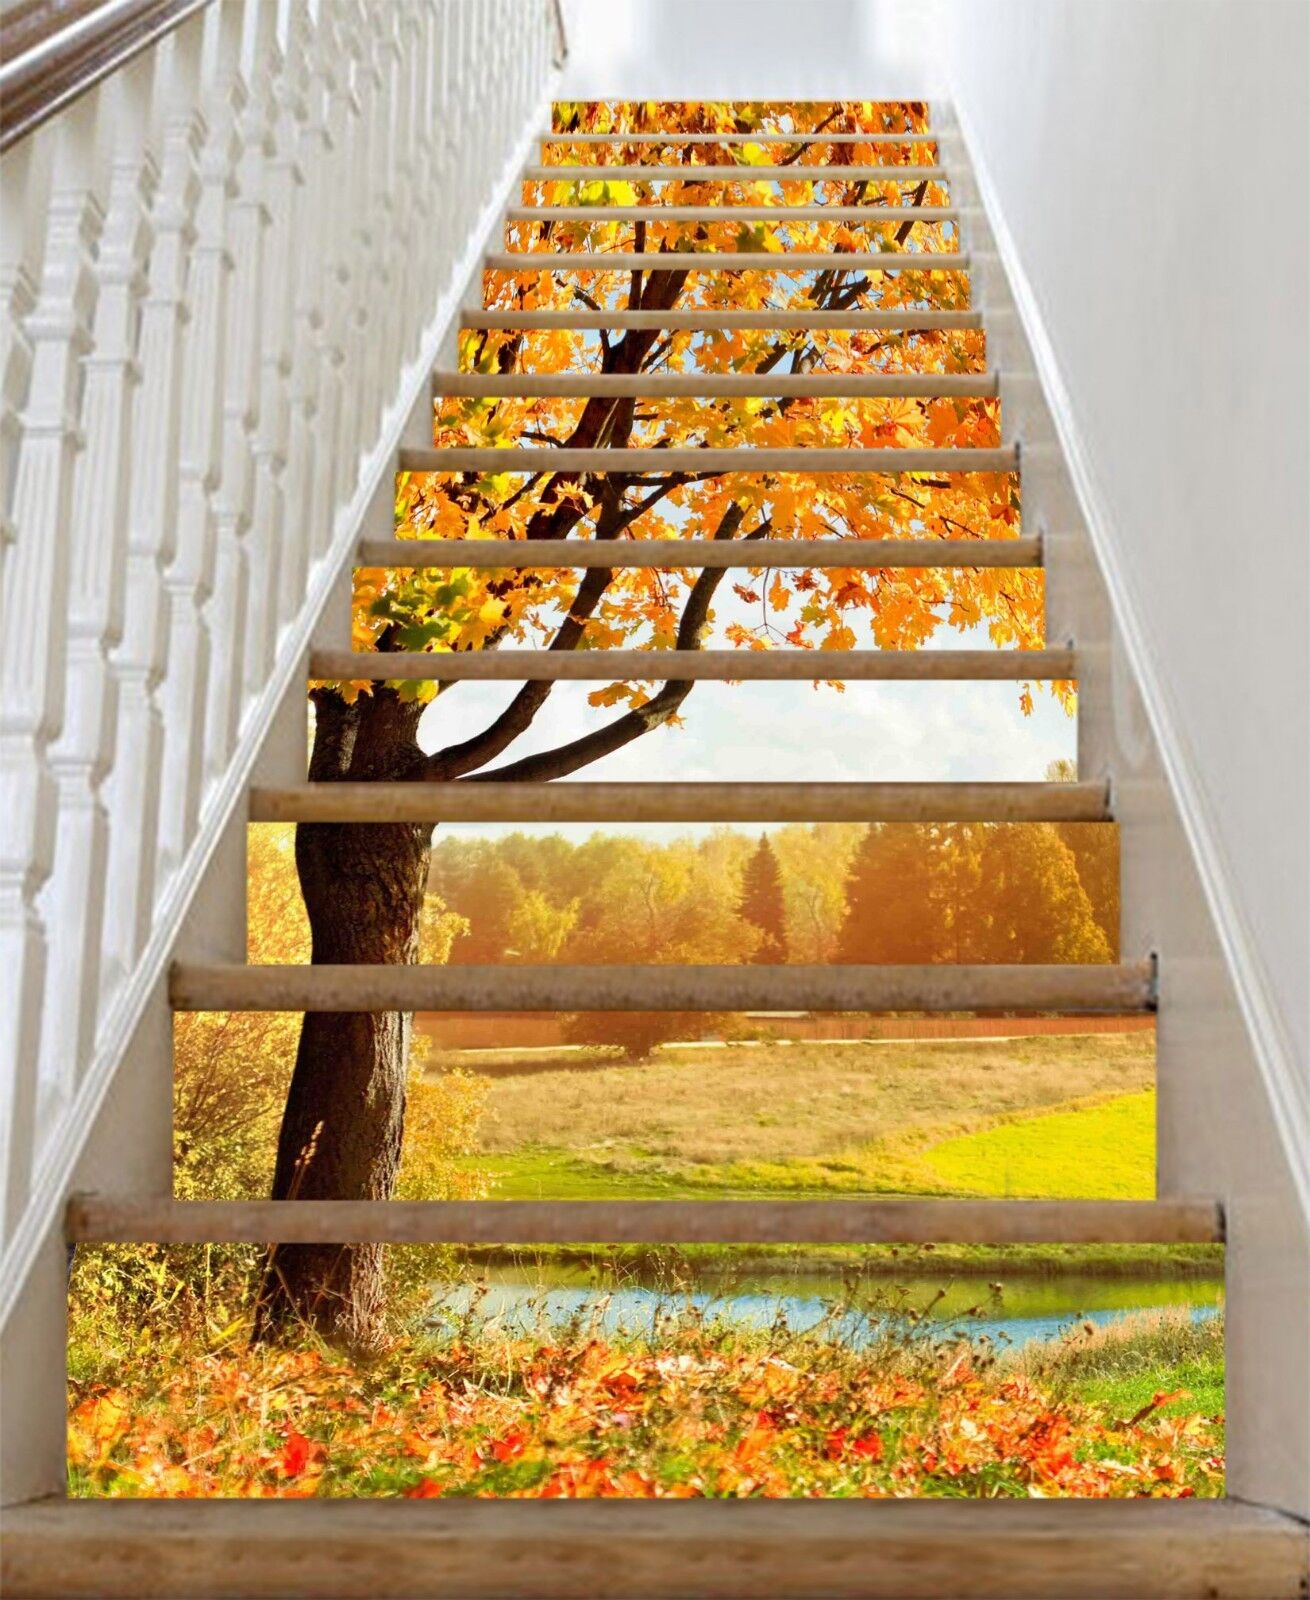 3D Schöner Baum 298 Stair Risers Dekoration Fototapete Vinyl Aufkleber Tapete DE